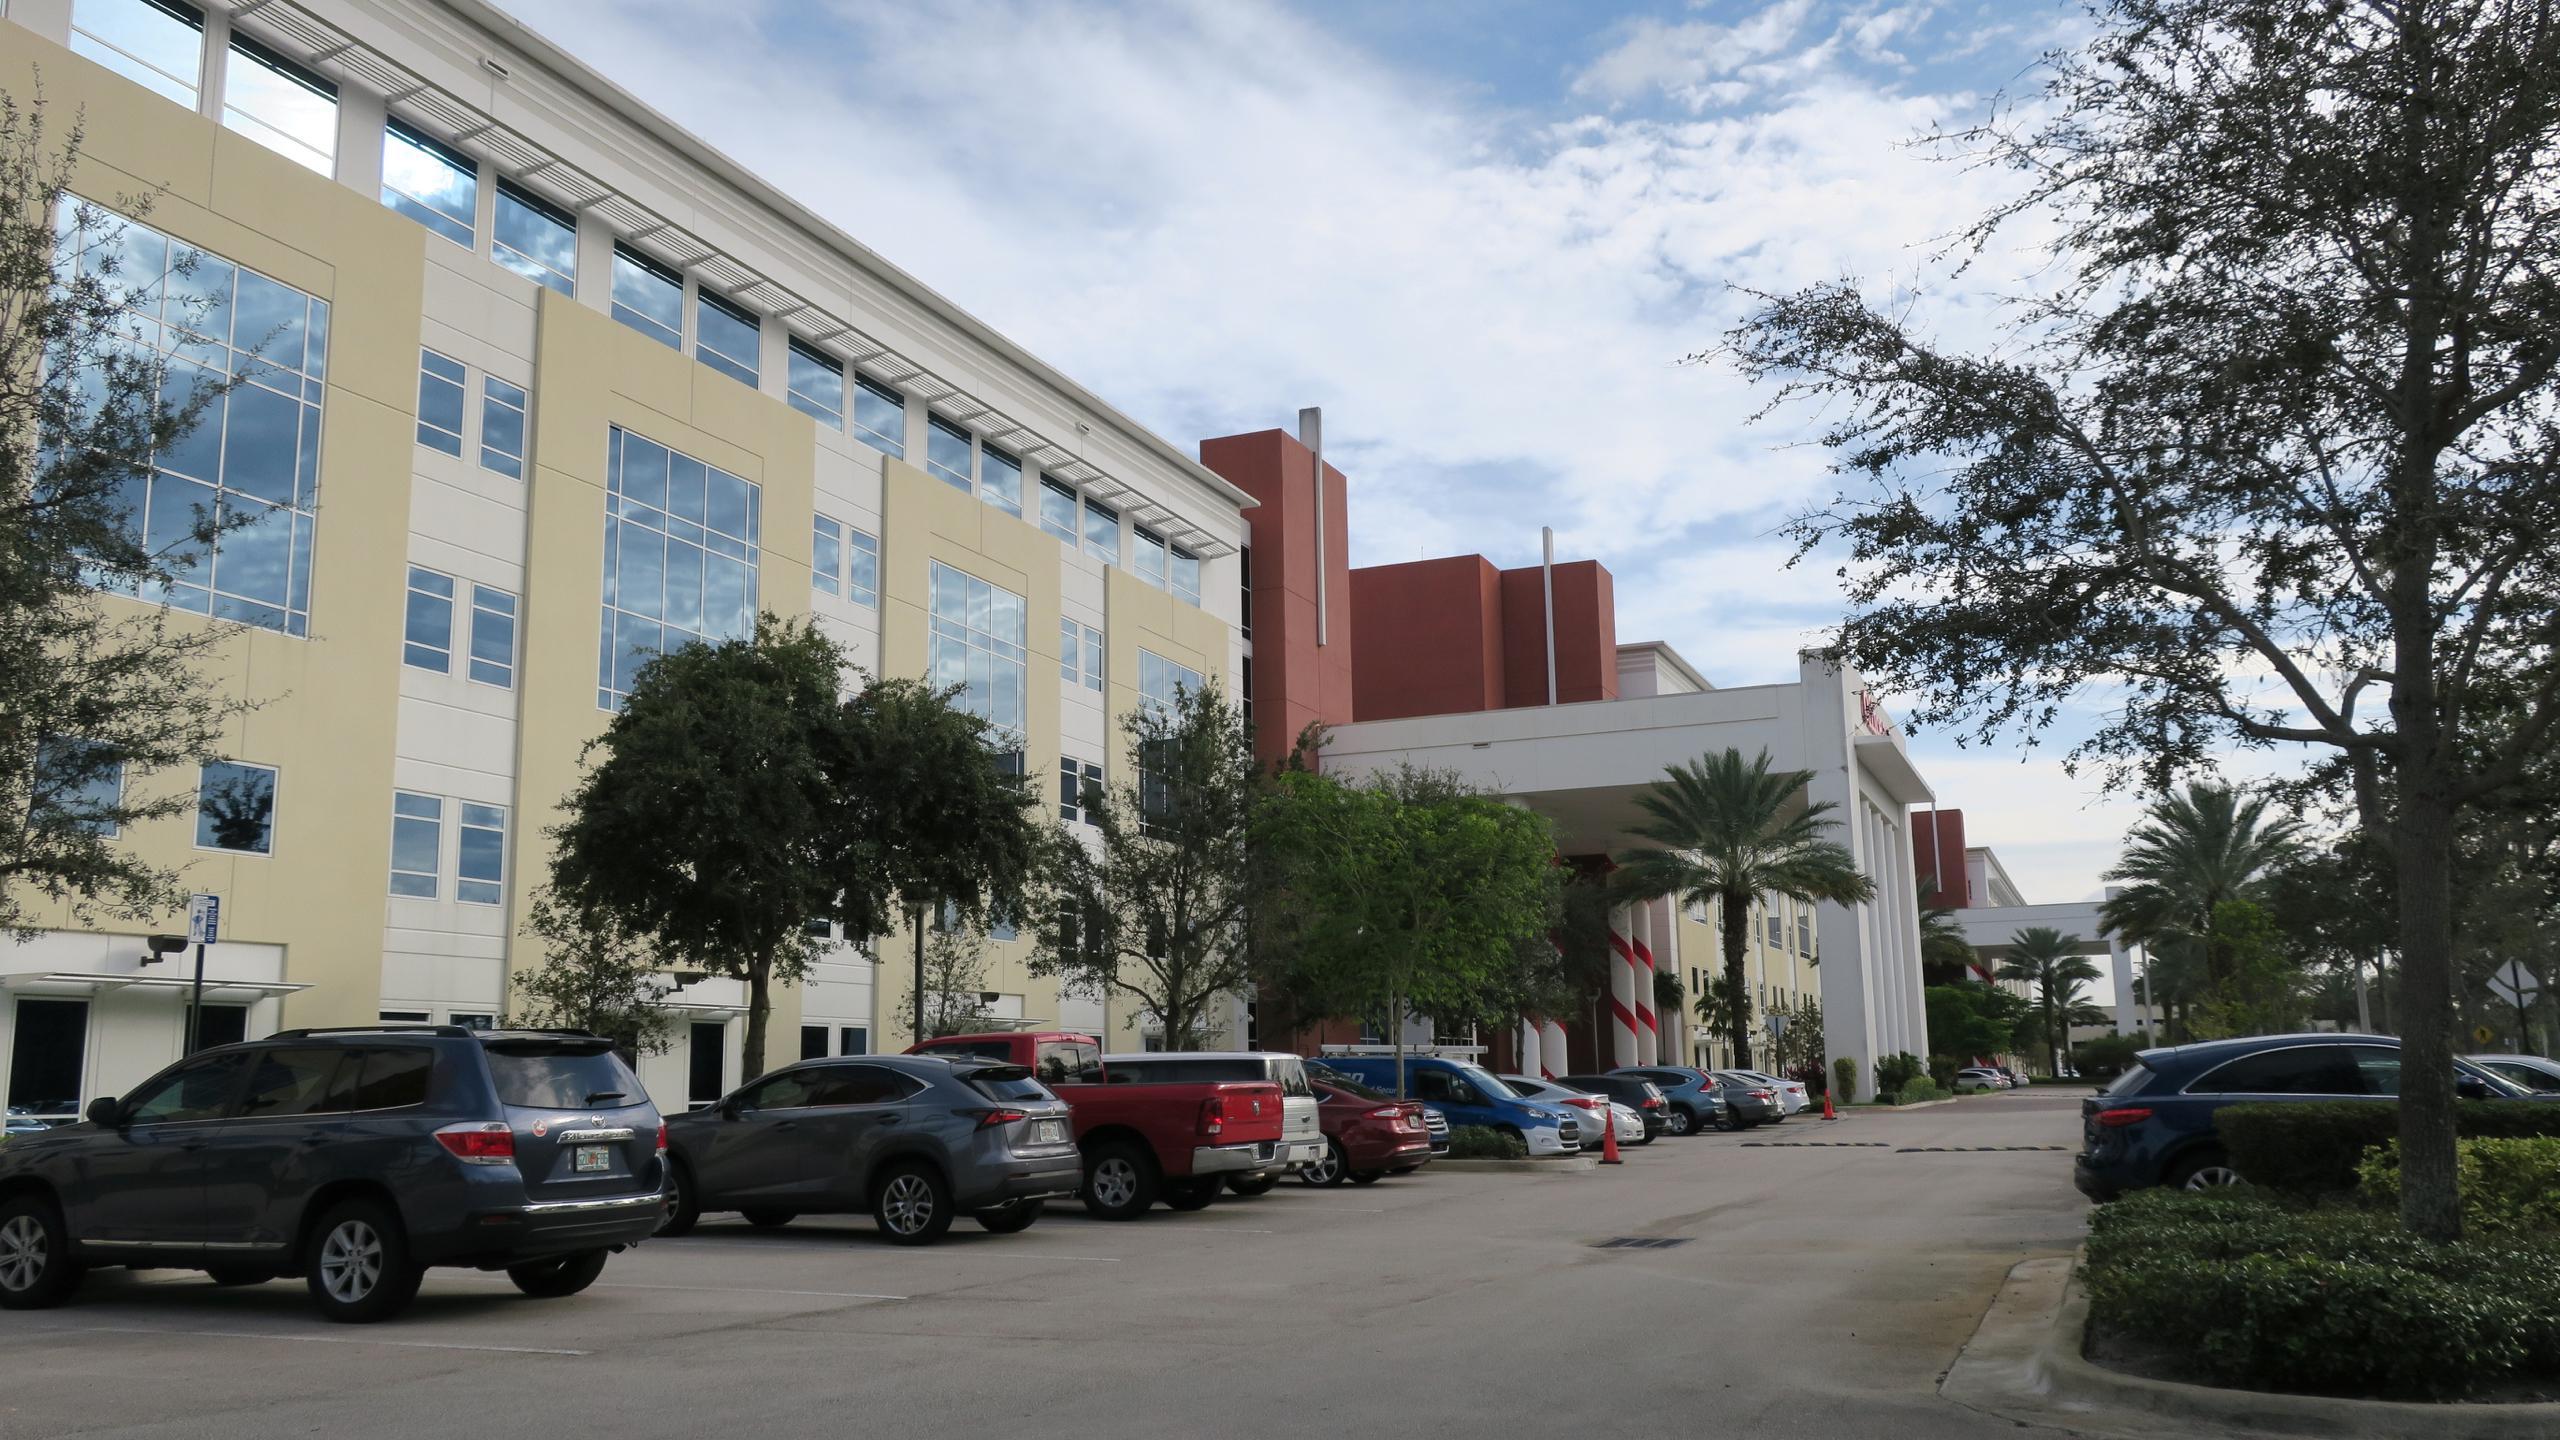 Office Depot's corporate headquarters in Boca Raton, Florida.